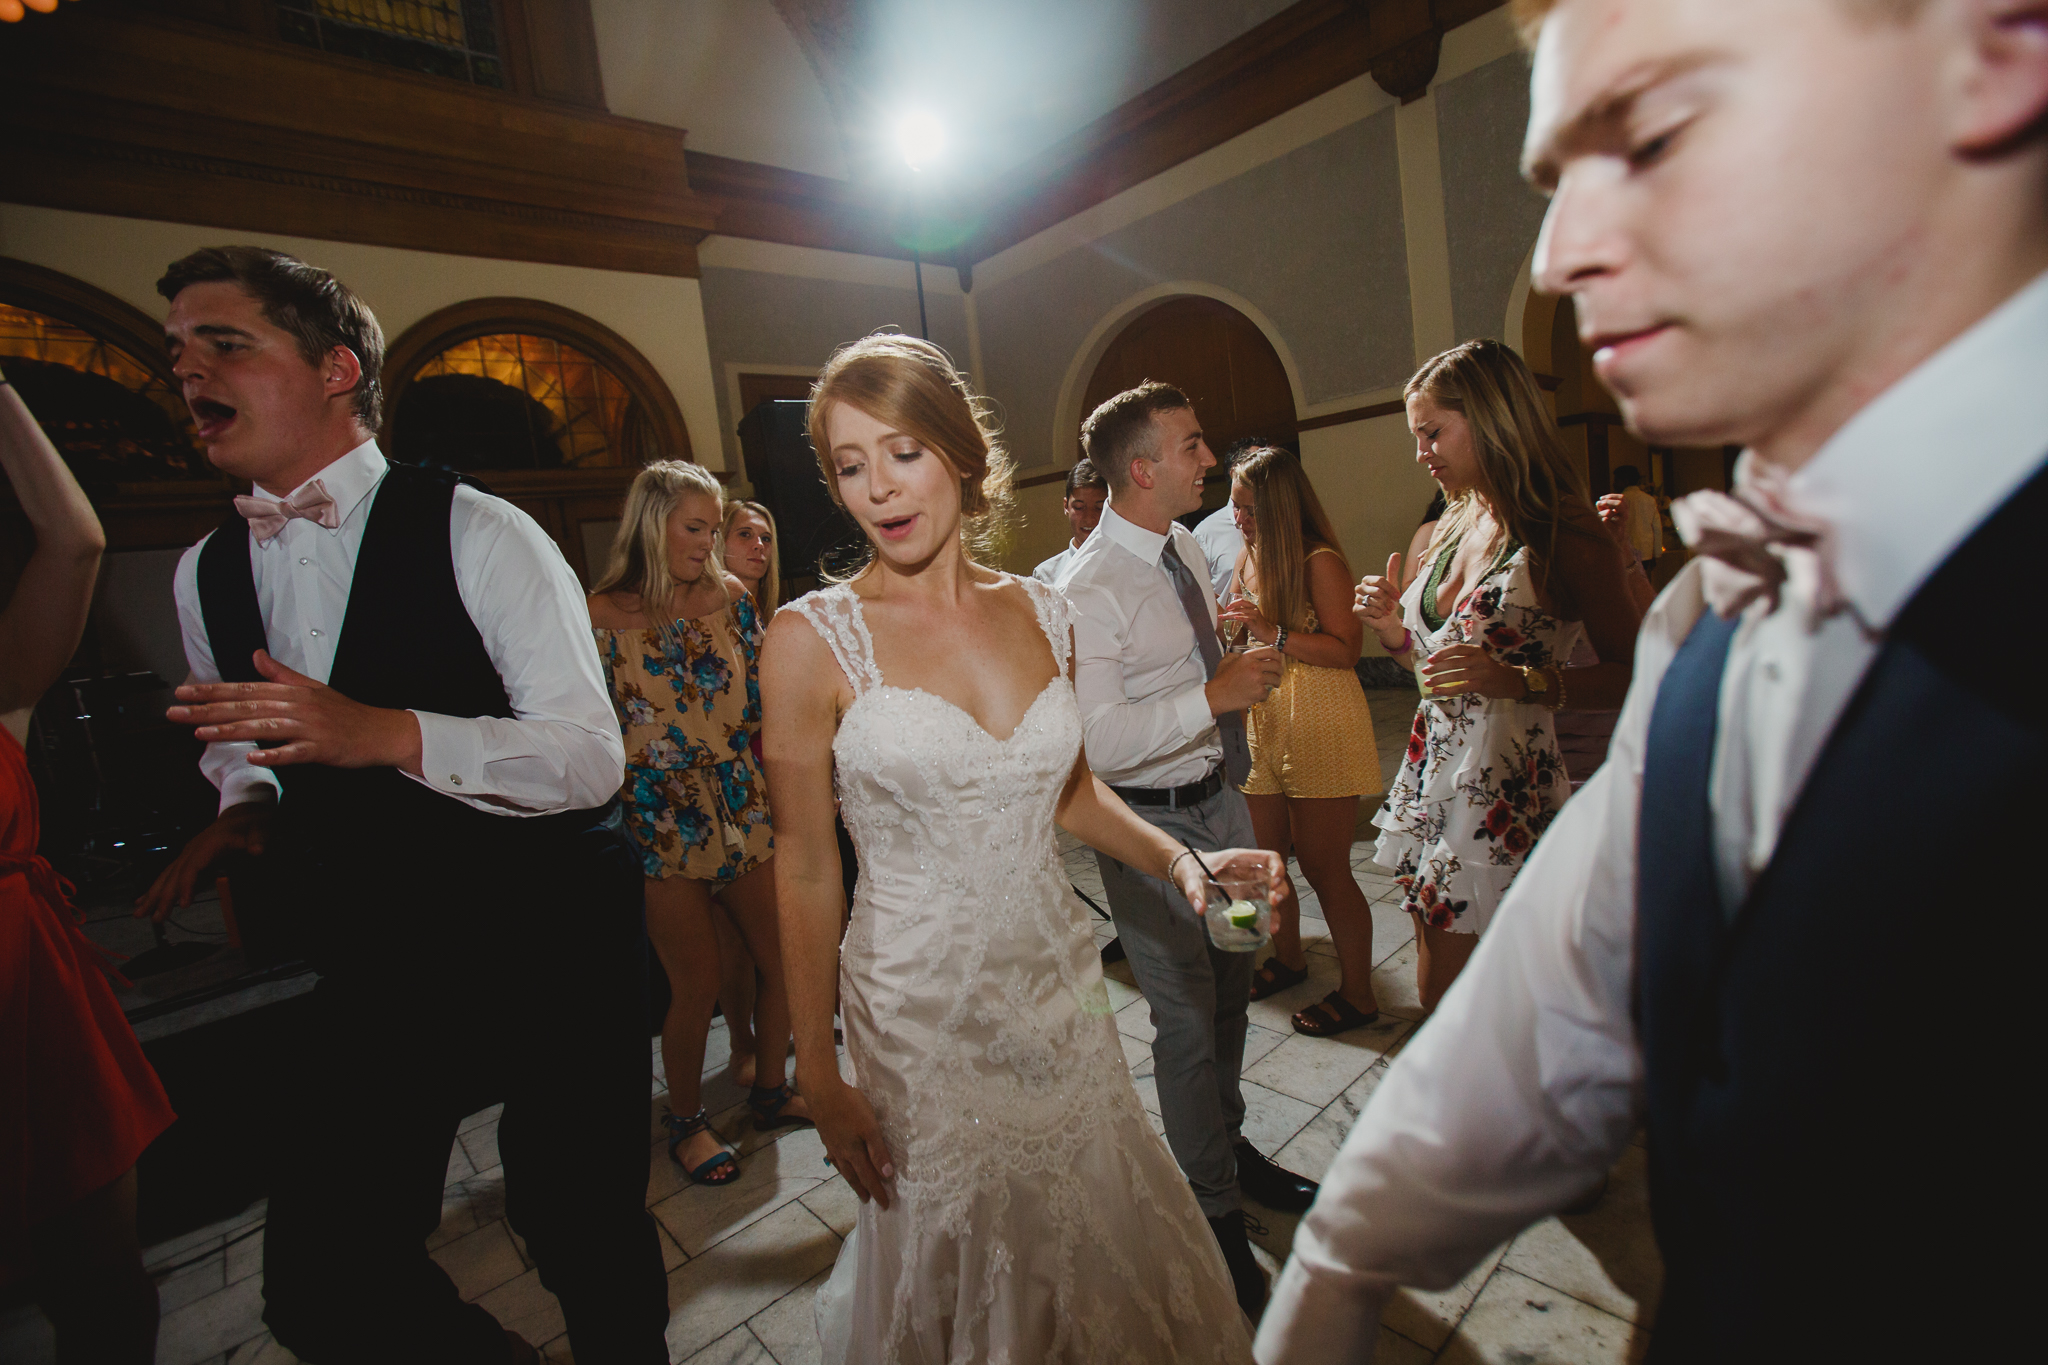 Michael and Kelly - the ashton depot - wedding DFW - wedding photographer- elizalde photography (138 of 150).jpg